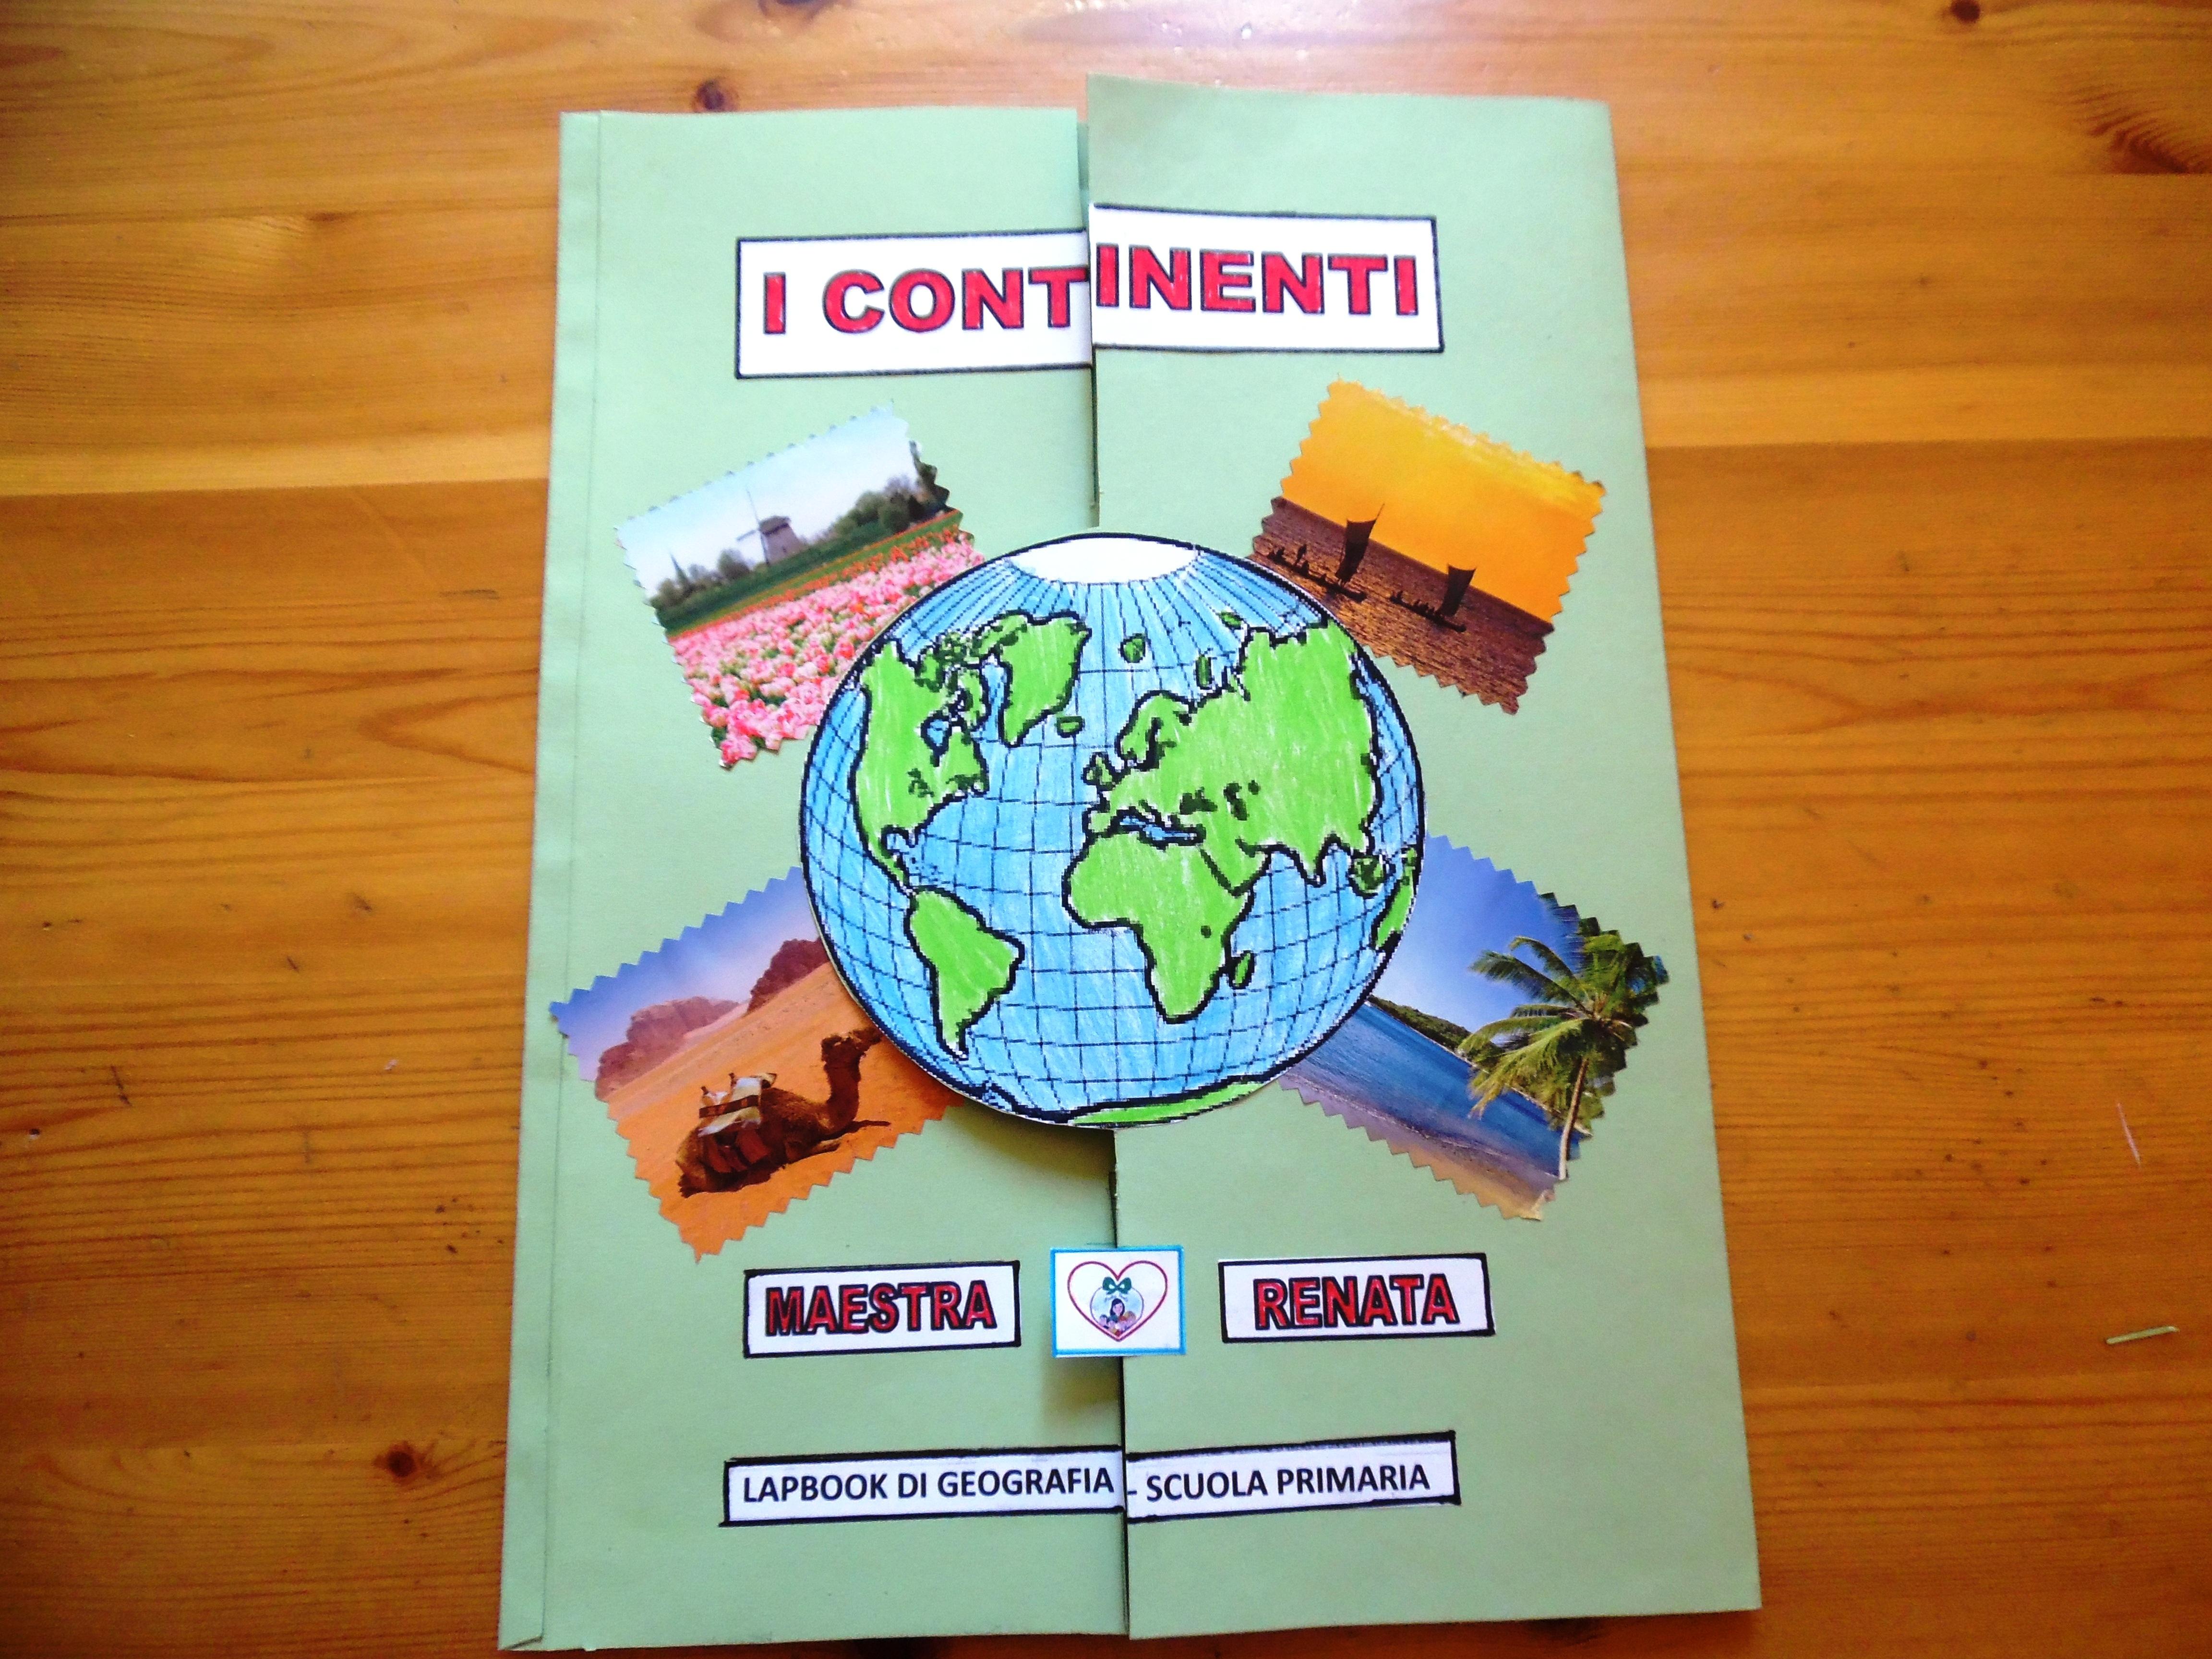 Lapbook Sui Continenti Maestrarenata